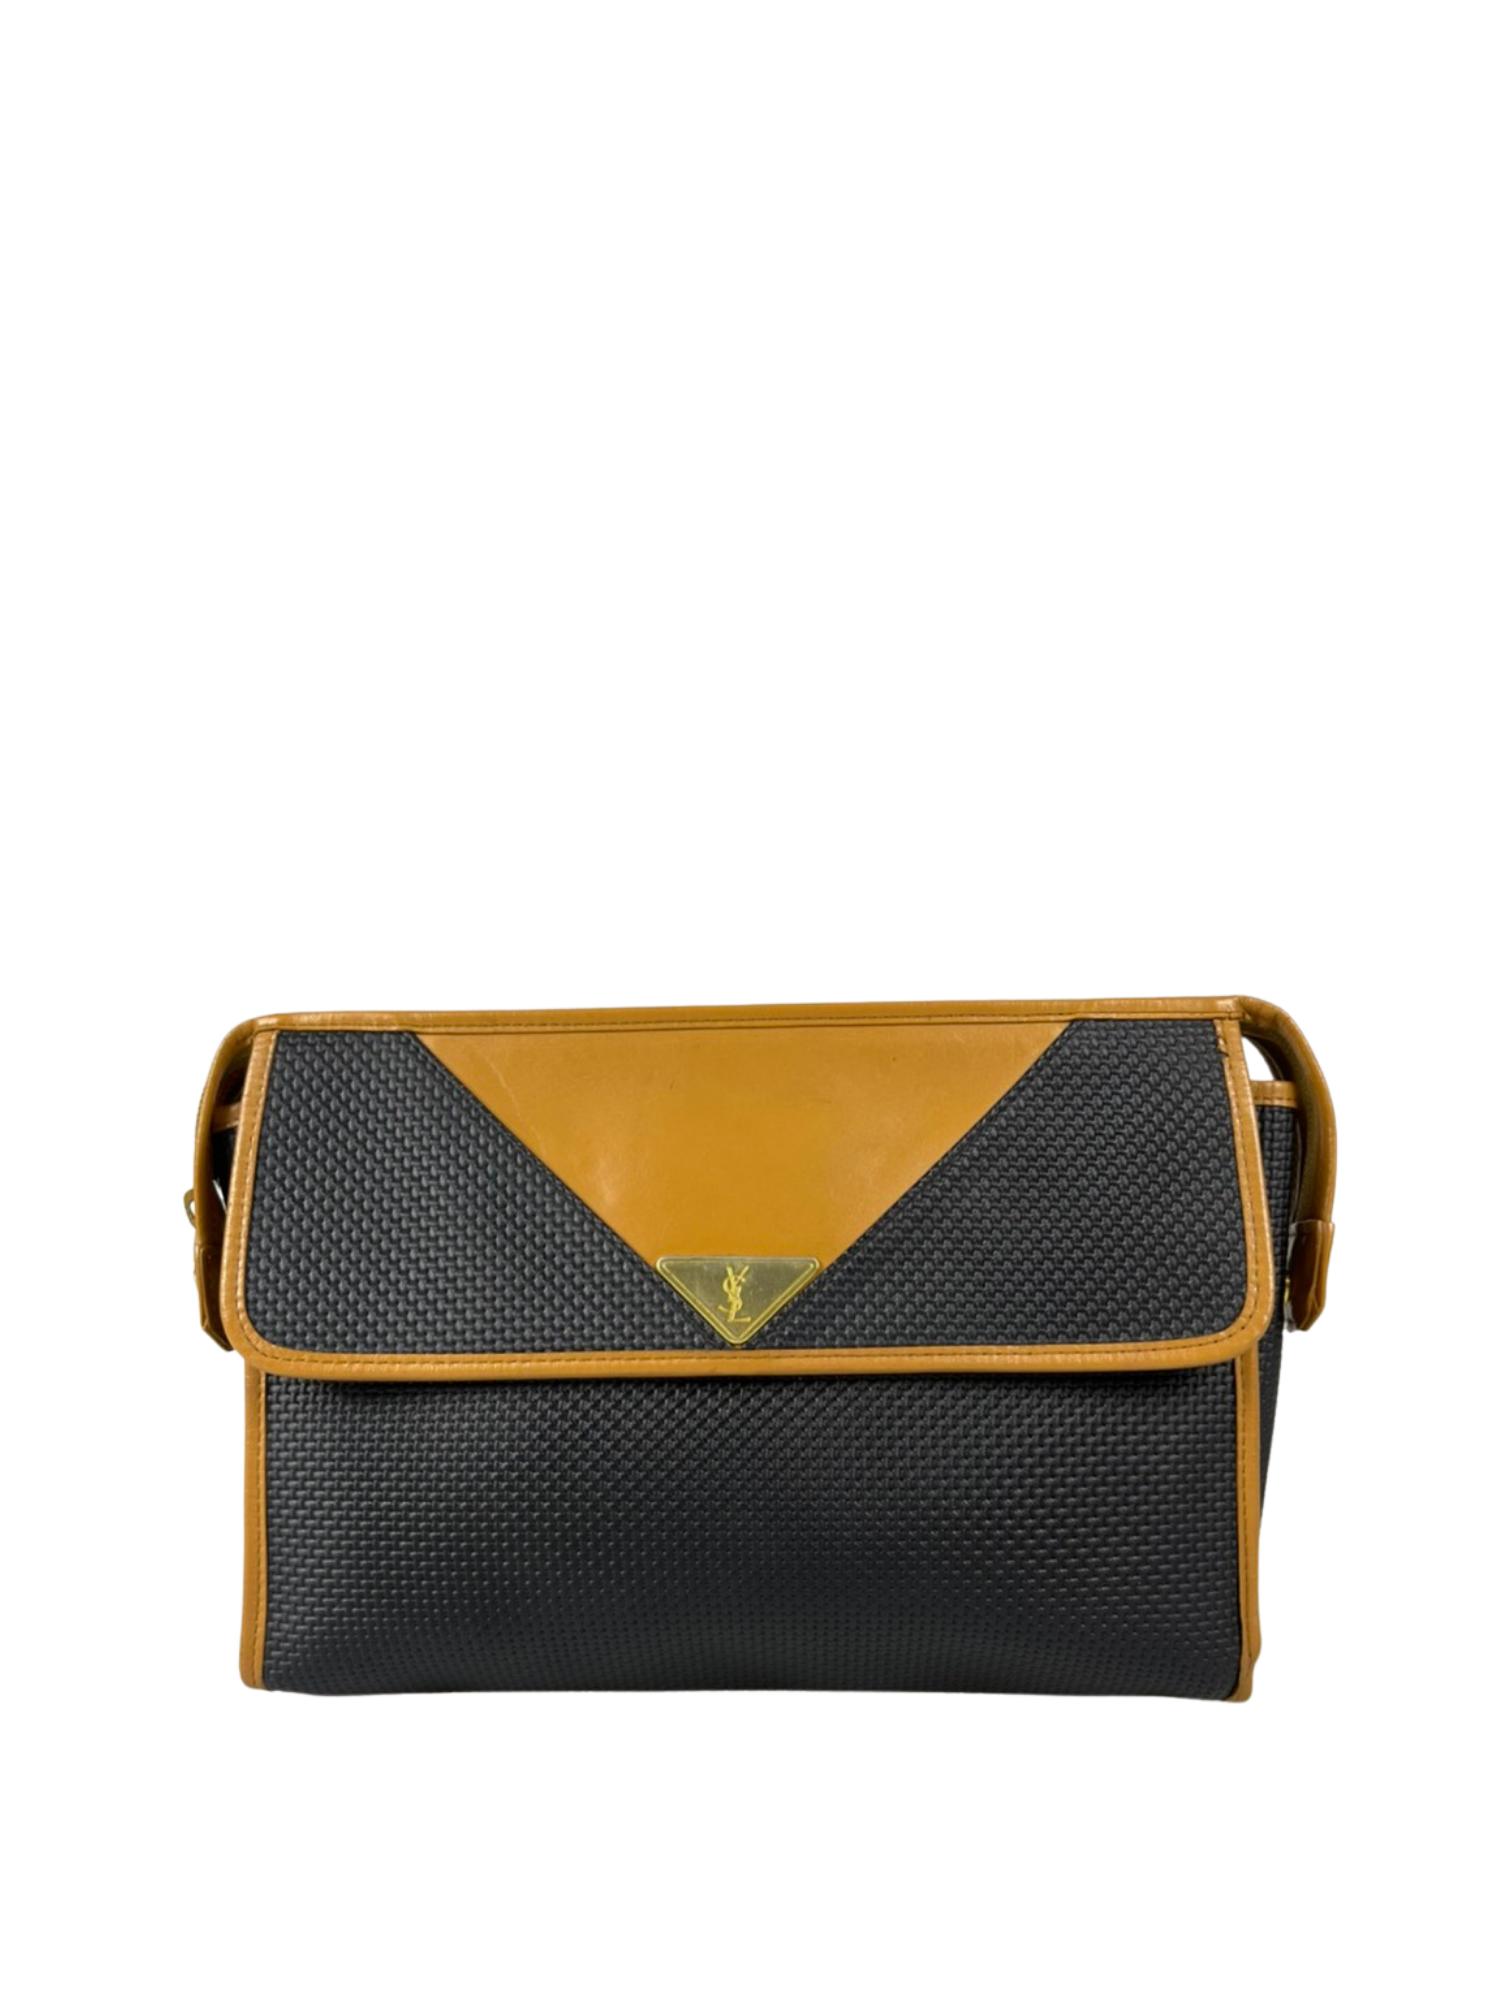 YSL (Yves Saint Laurent ) Black Woven Flap Clutch Bag